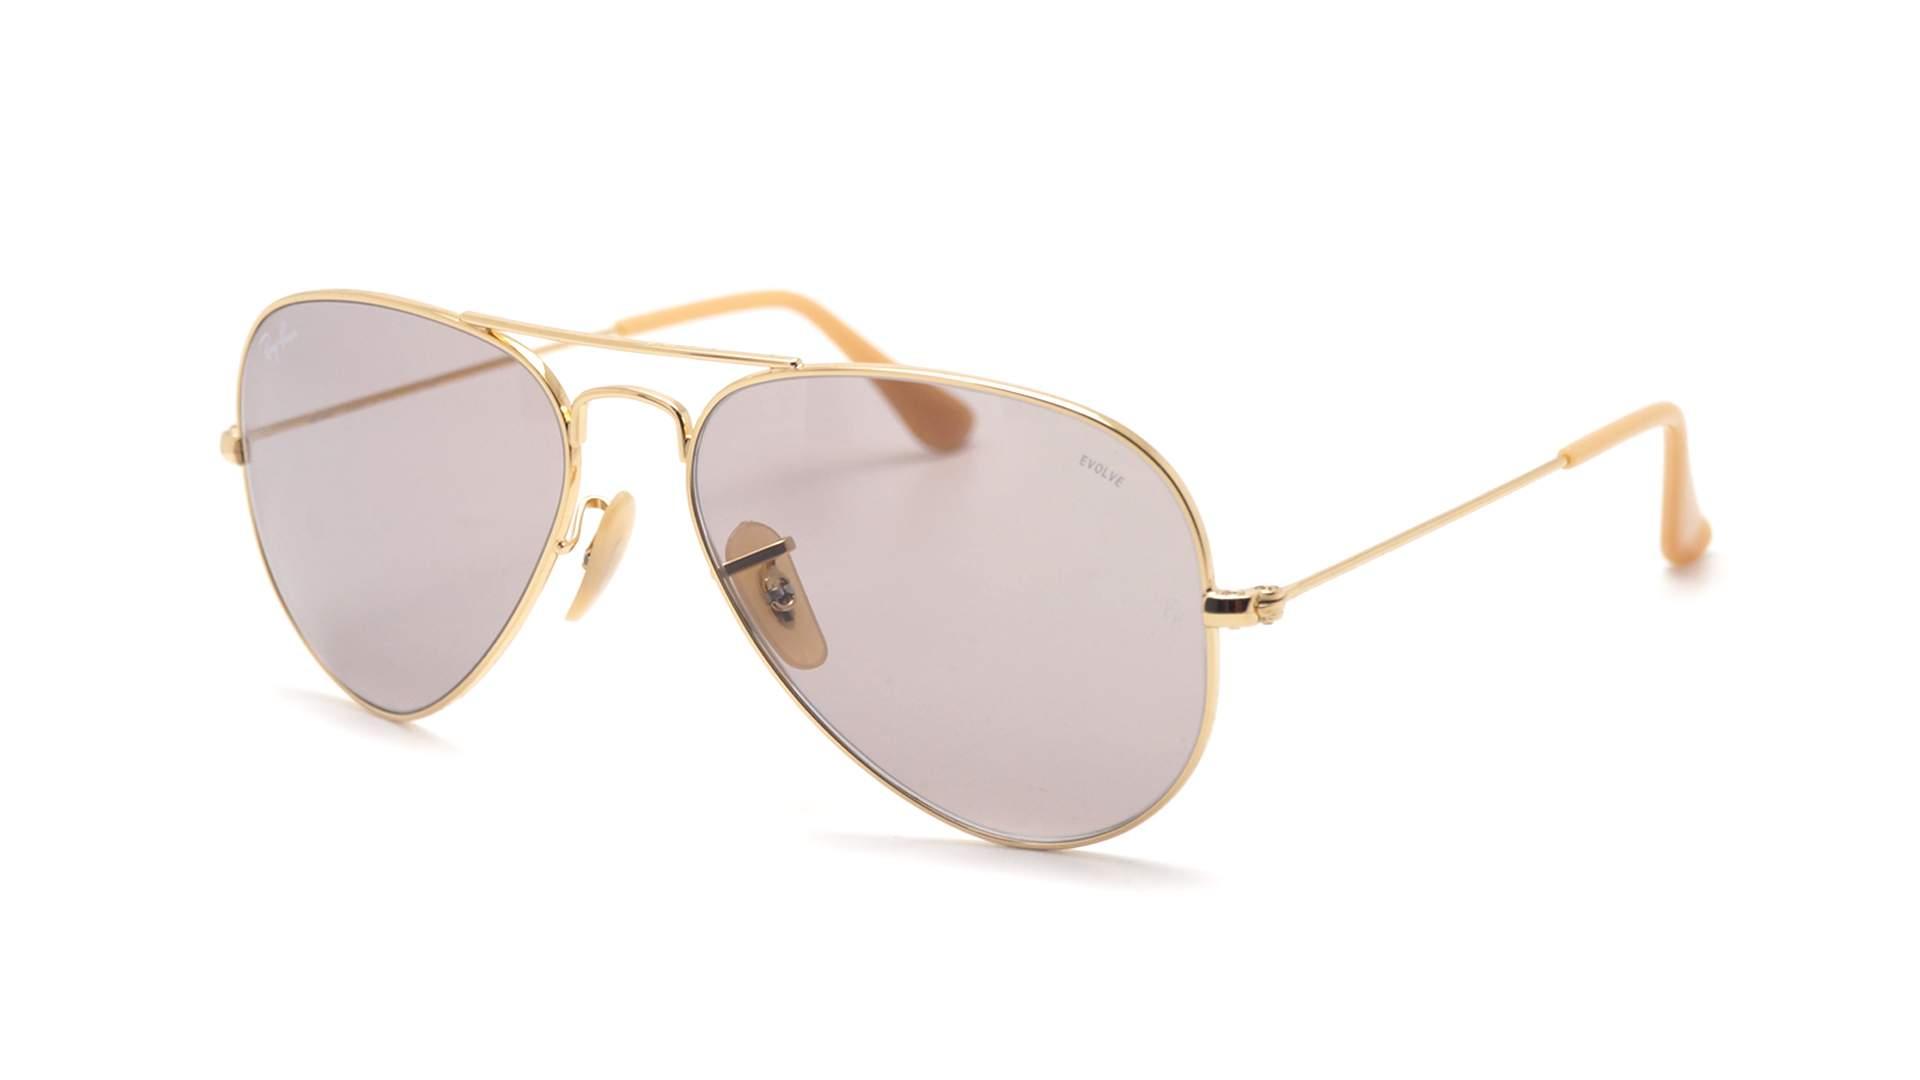 32c07b533 Sunglasses Ray-Ban Aviator Evolve Gold RB3025 9064/V8 55-14 Small  Photochromic